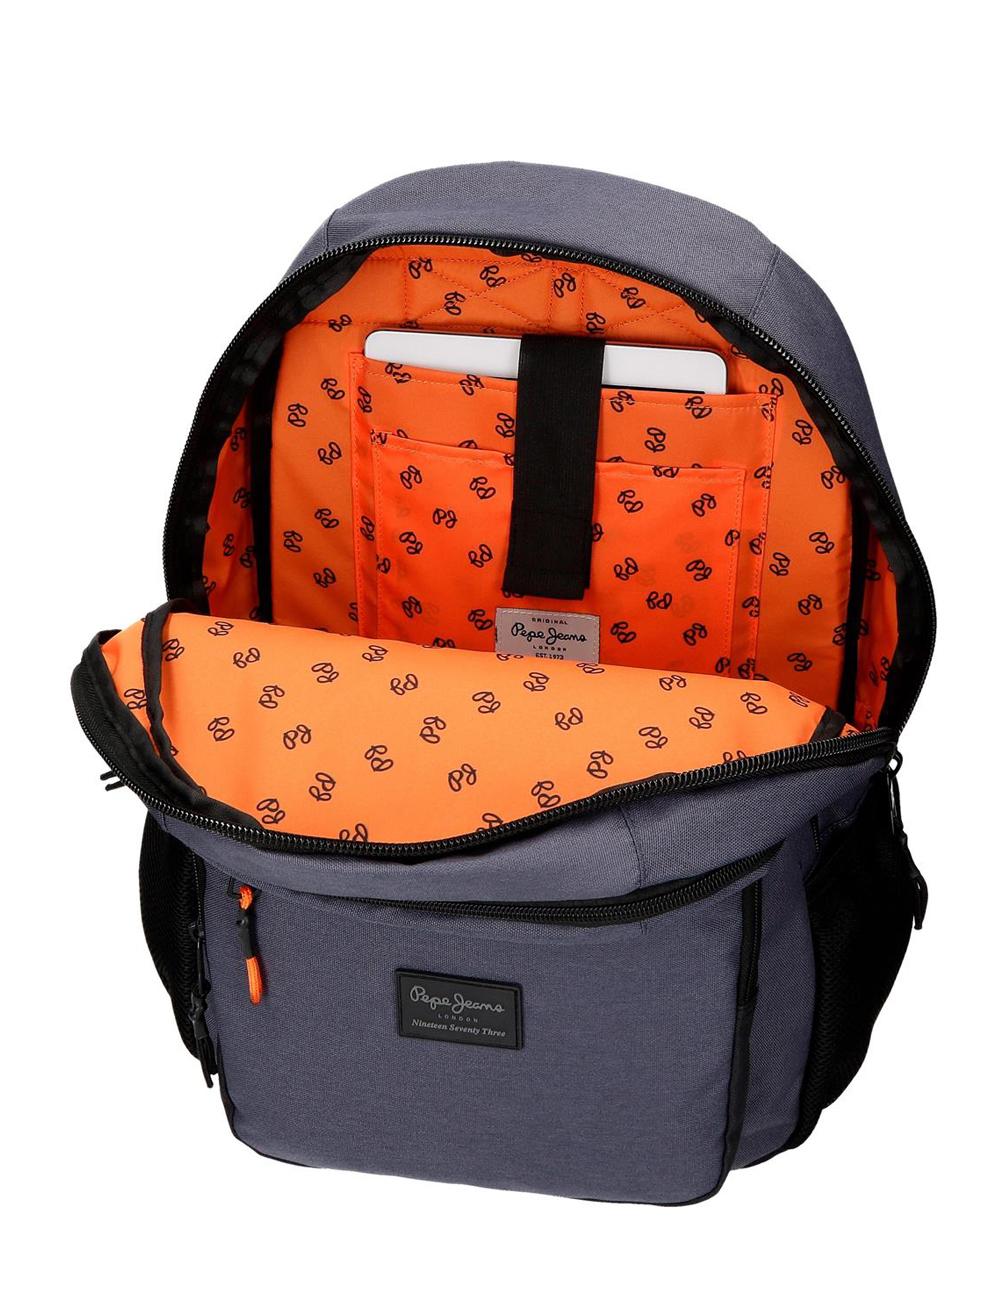 6282421 Mochila 46 cm Porta Tablet Doble C. Pepe Jeans Troy